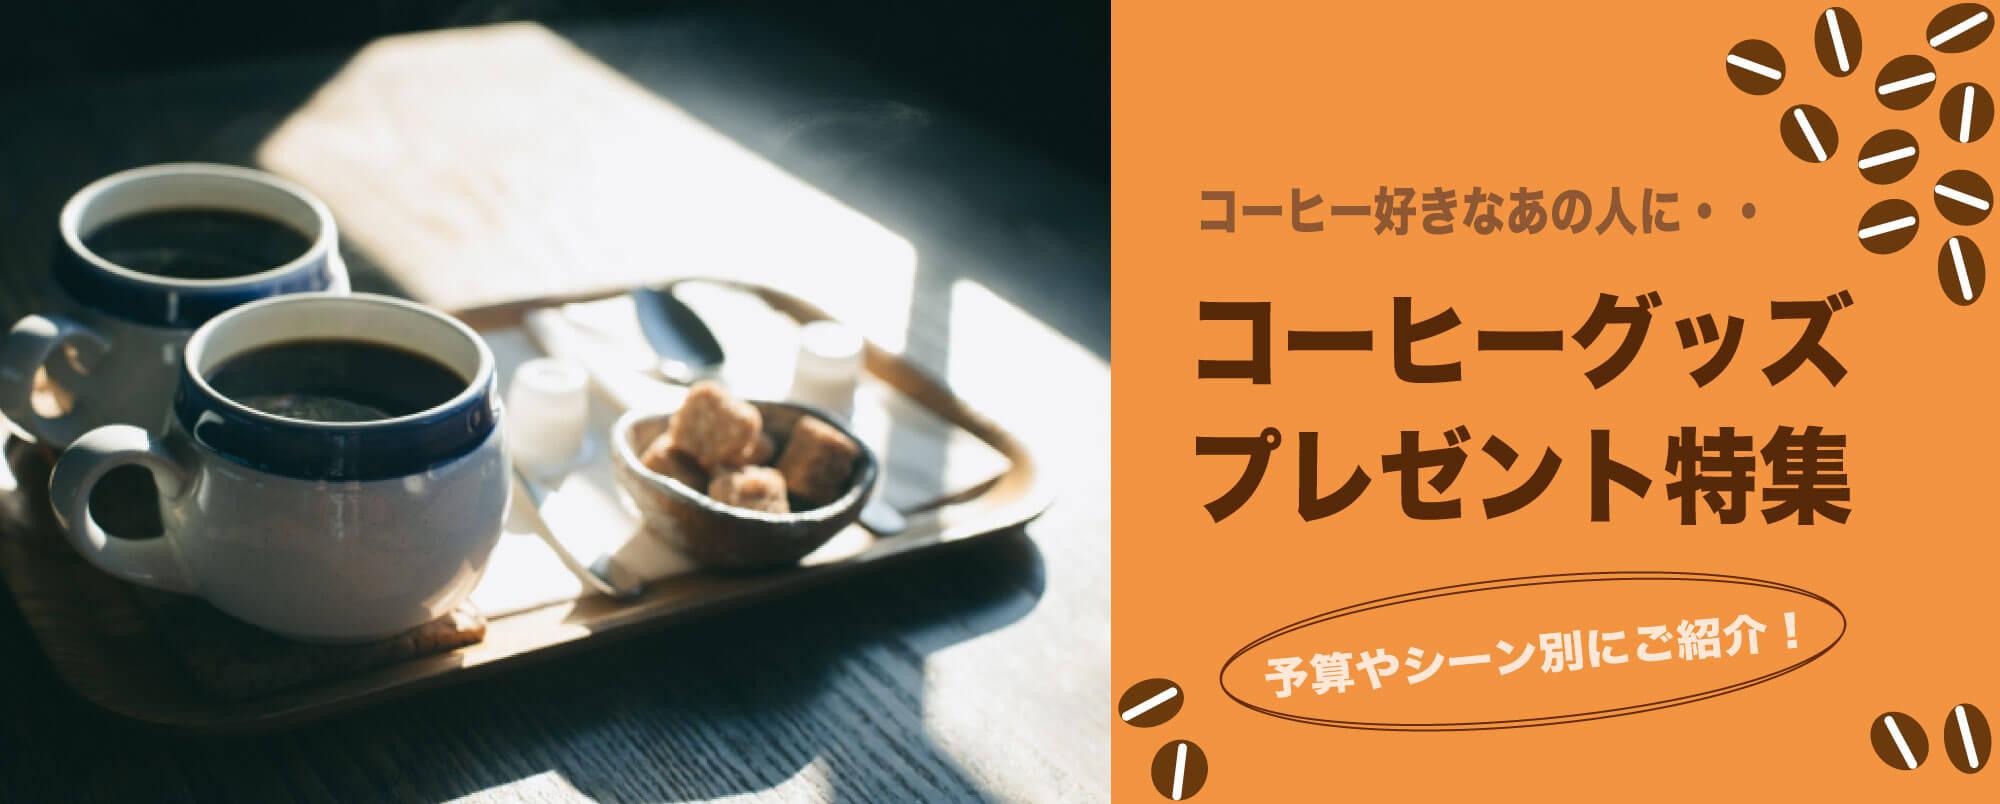 coffee-present-banner.jpg